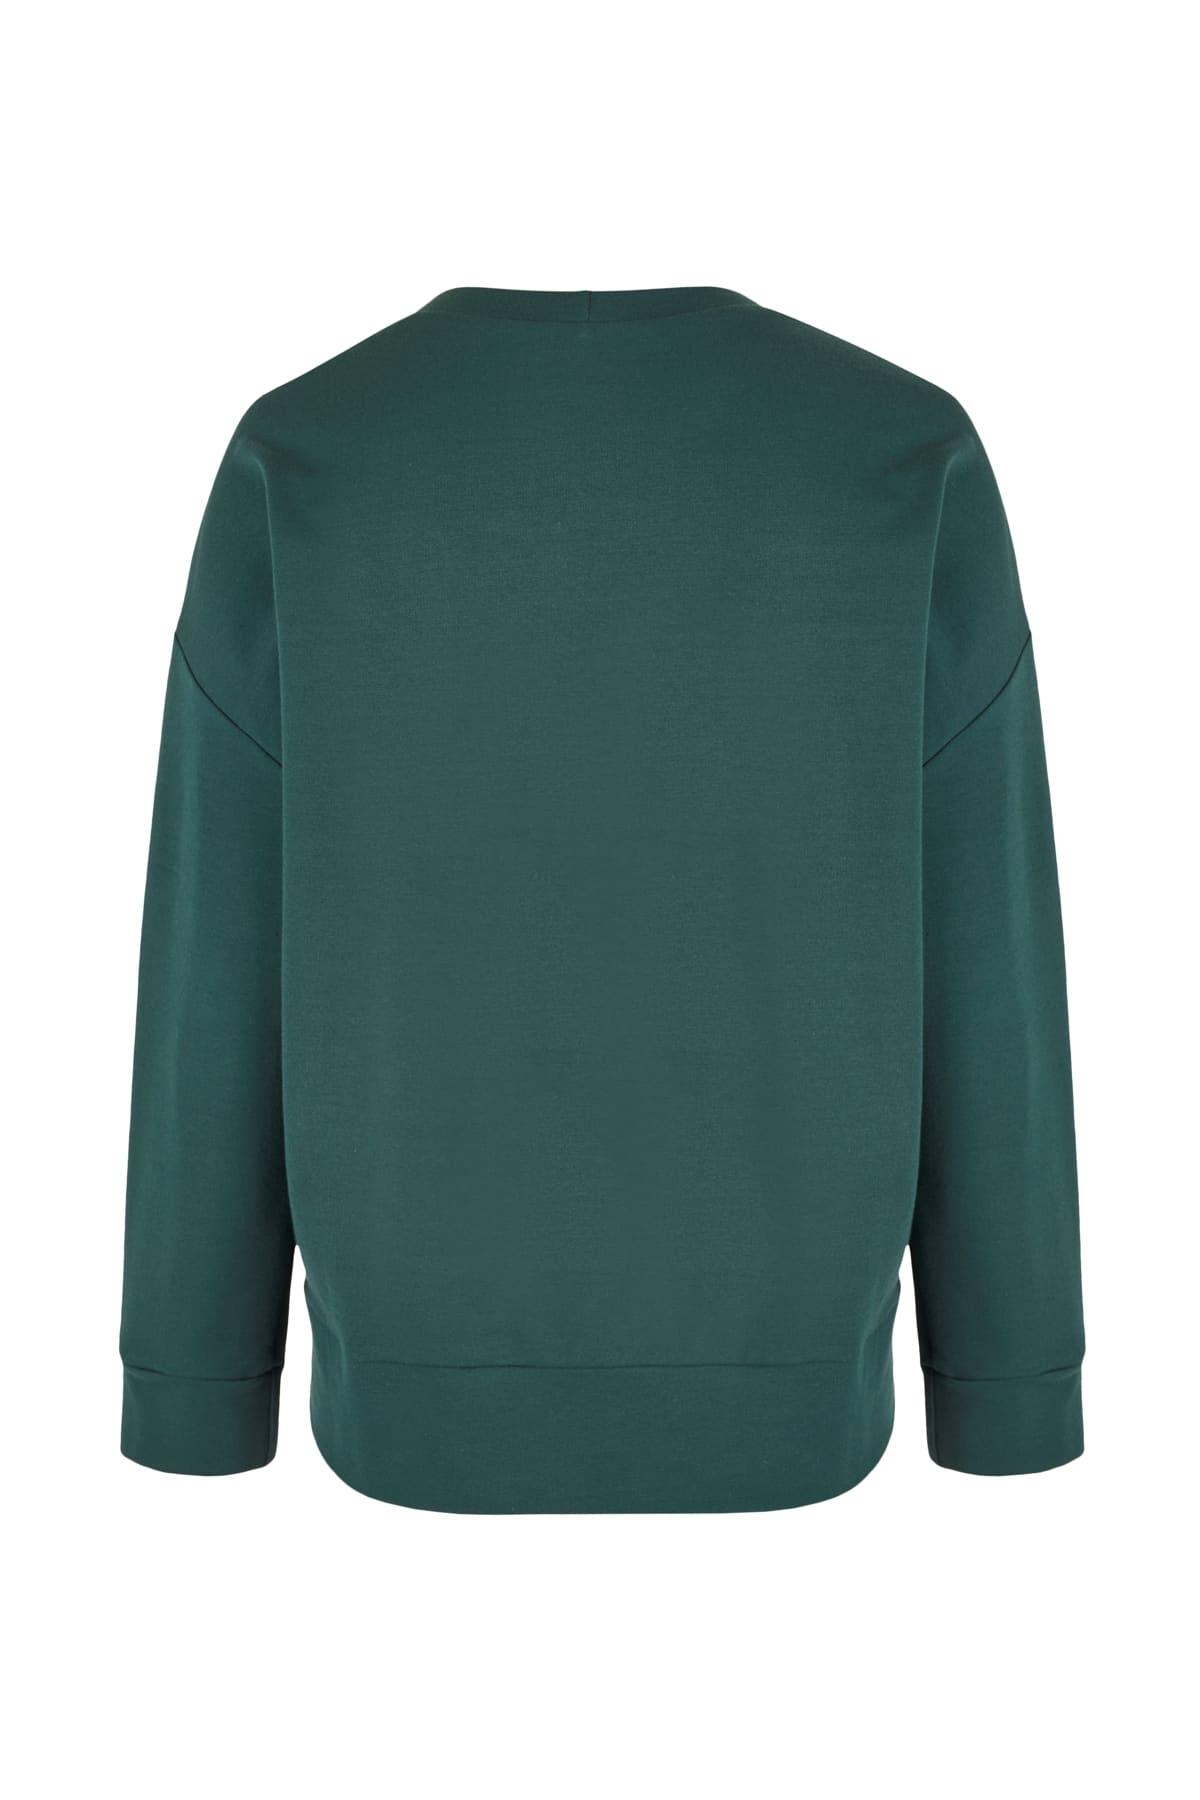 sweatshirt green back